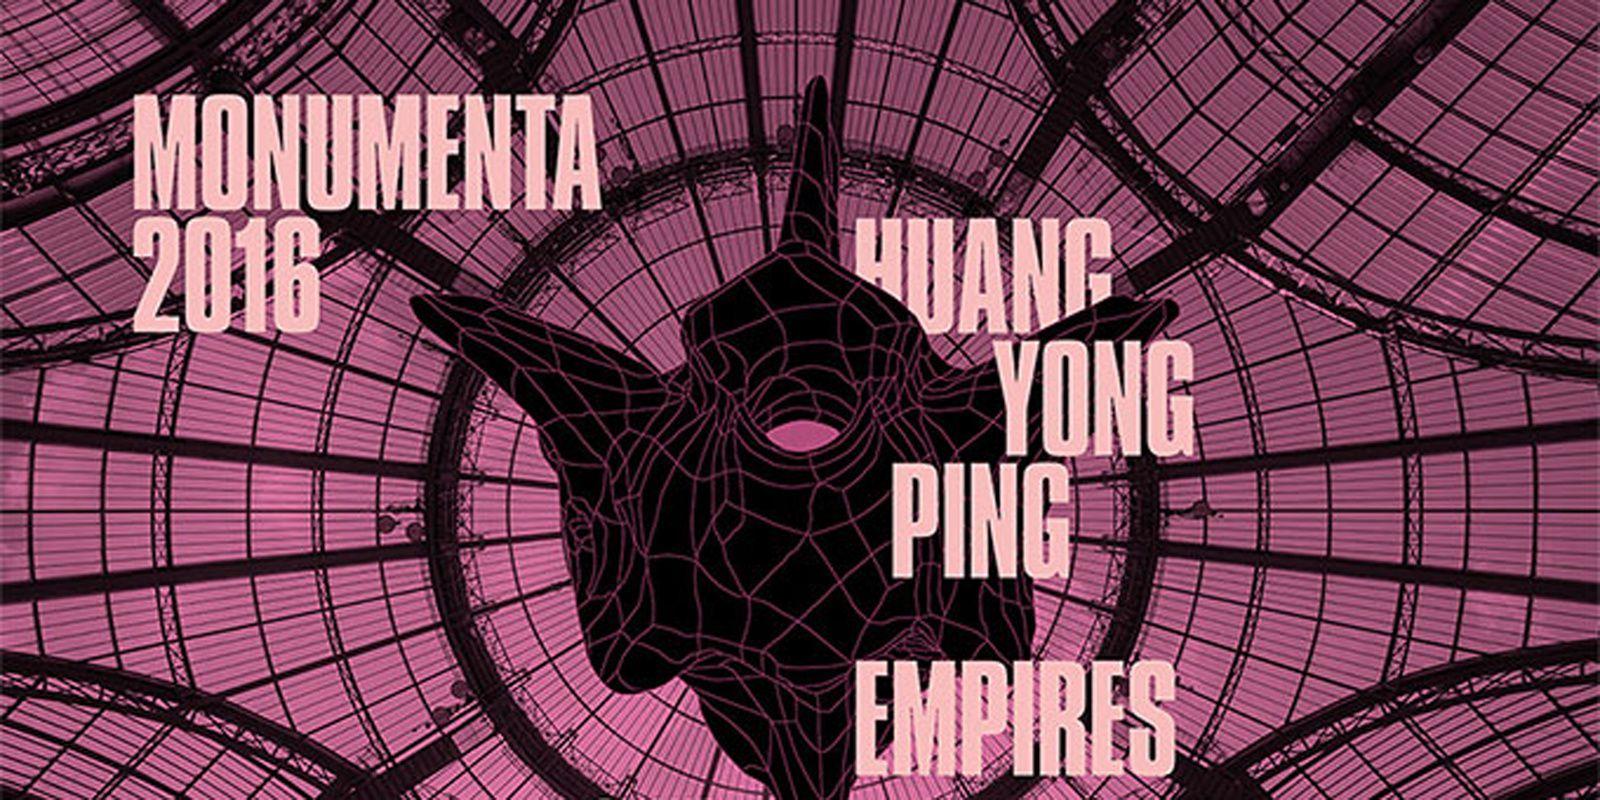 MONUMENTA 2016: Huang Yong Ping &quot&#x3B;Empires&quot&#x3B;